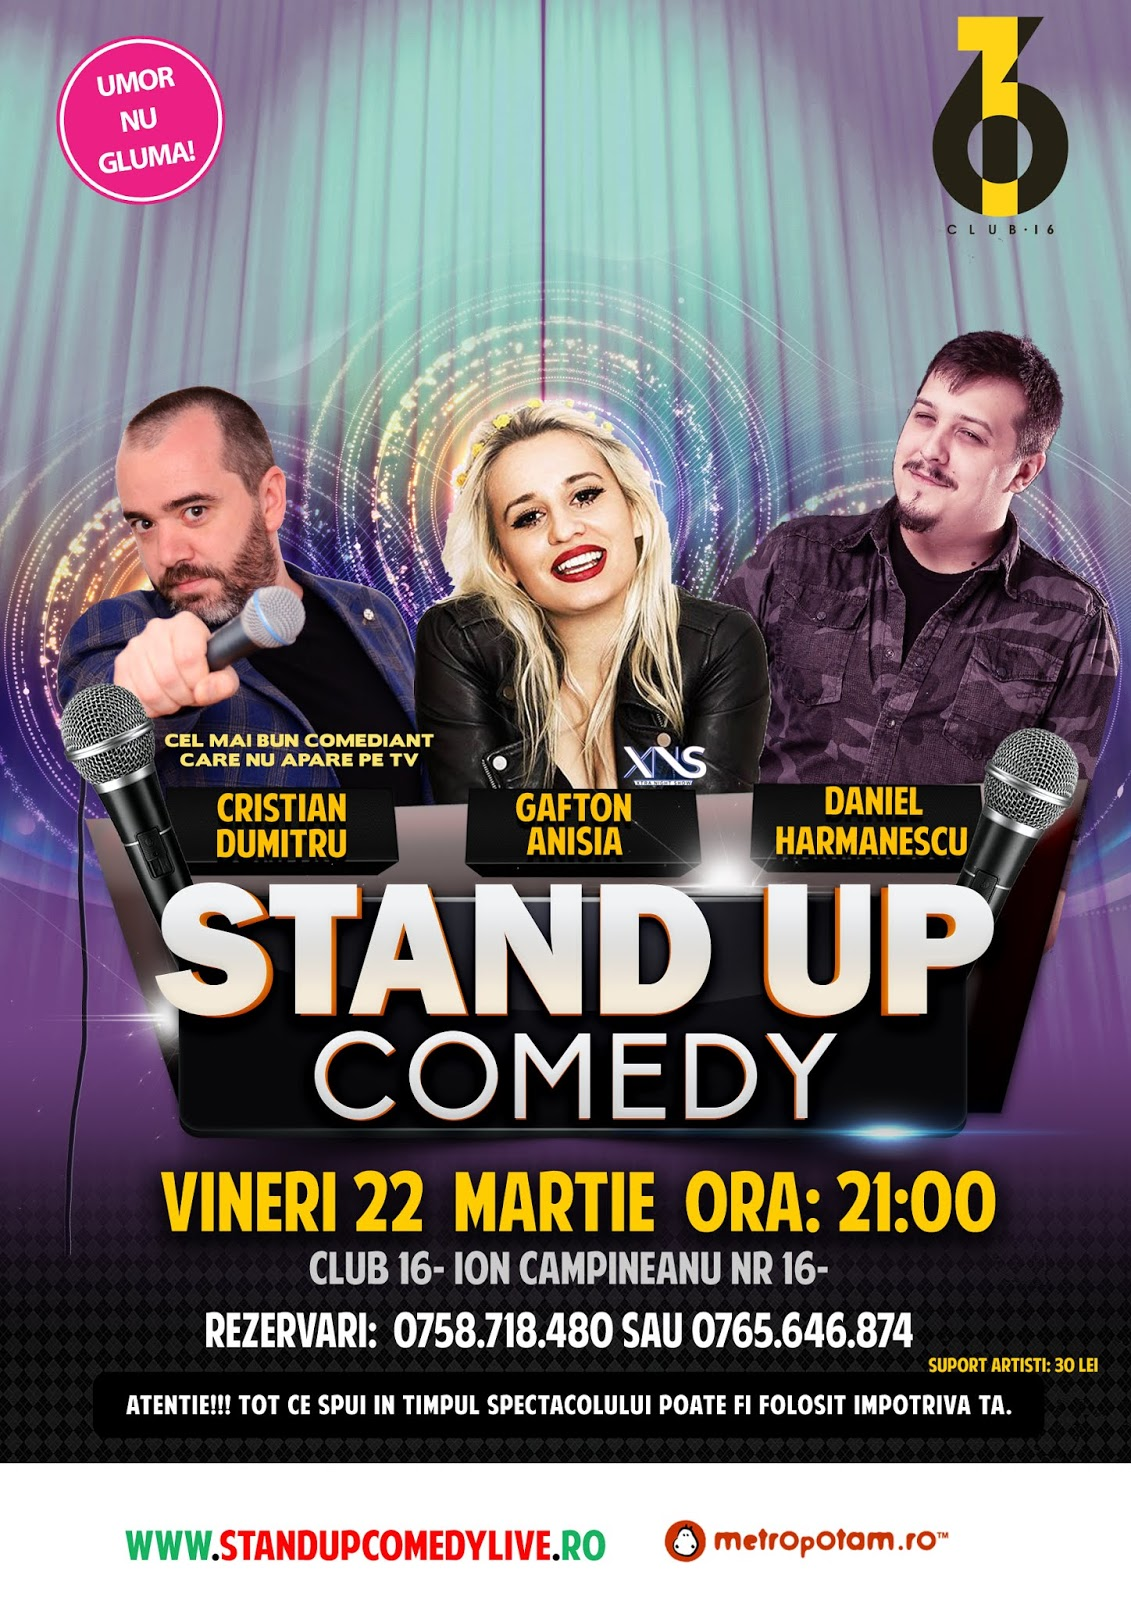 Stand-Up Comedy Bucuresti Vineri 22 Martie 2019